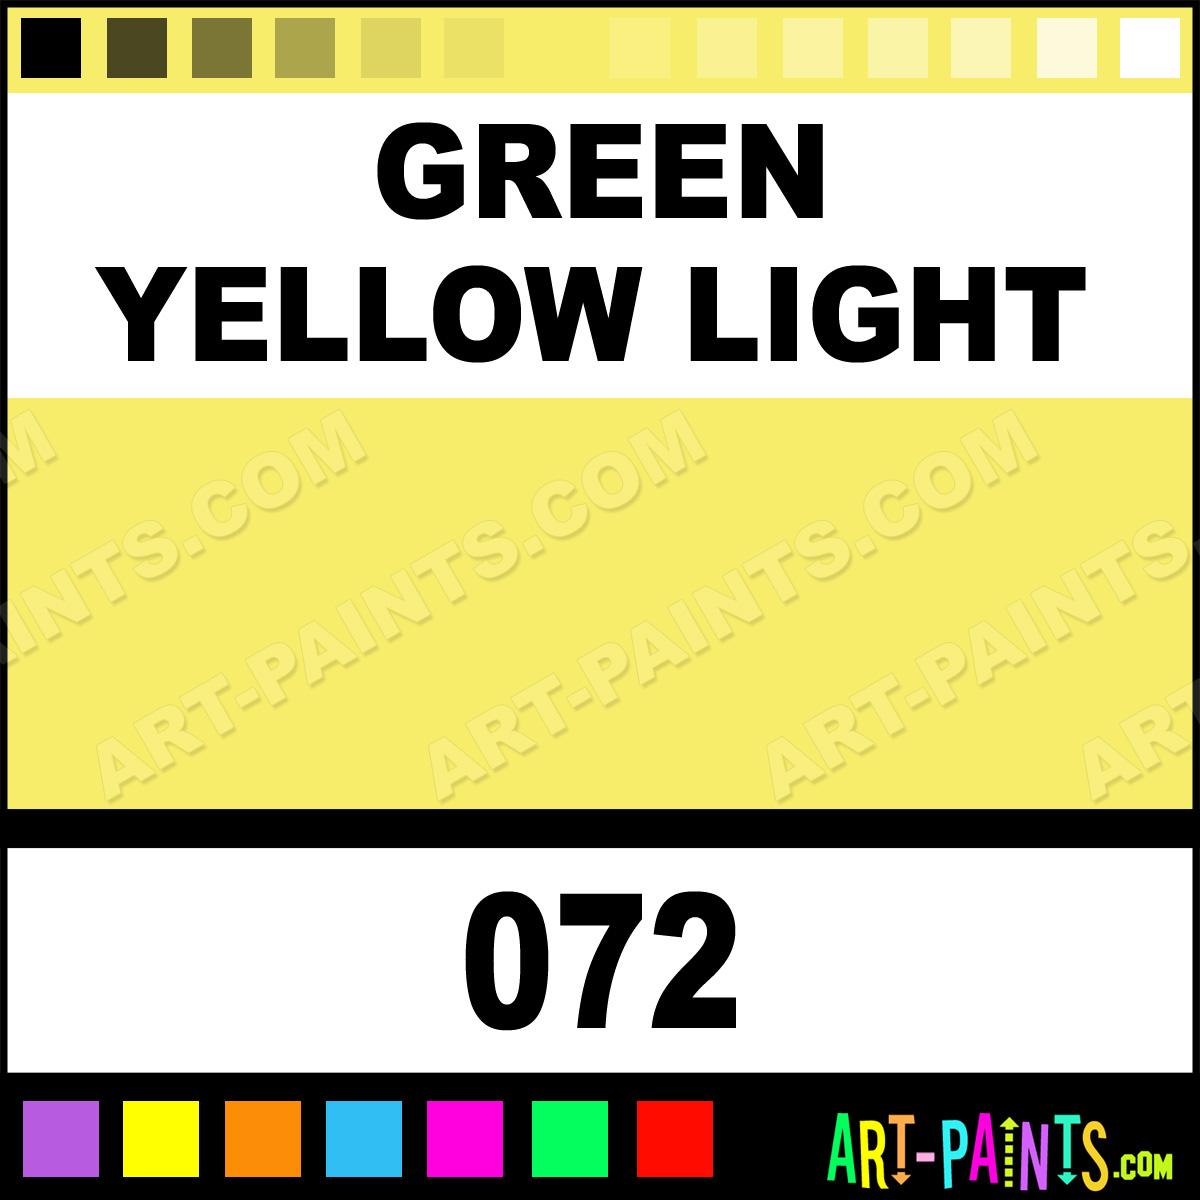 Green yellow light oil pastel paints 072 green yellow Light pastel green paint